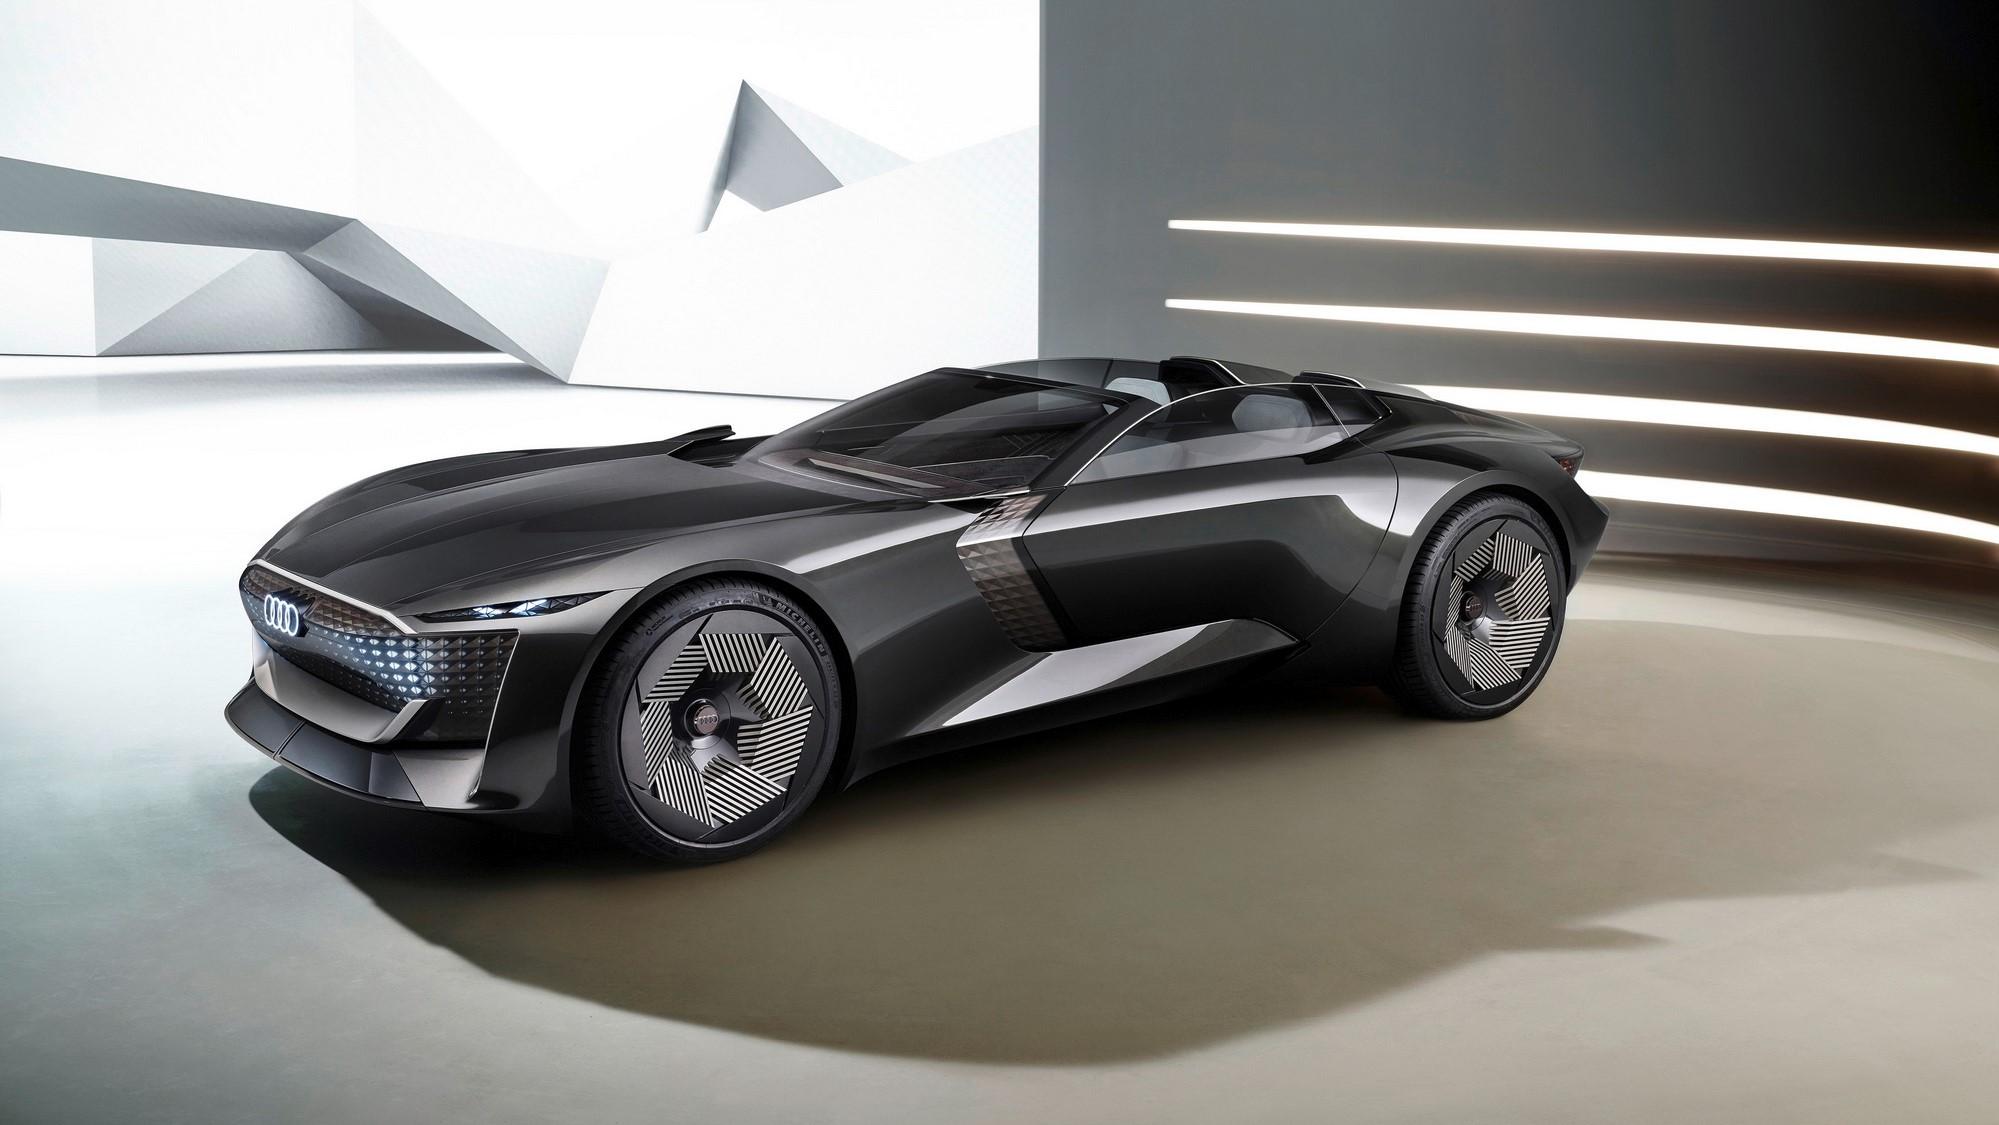 Audi: Μας δείχνει το μέλλον με το πρωτότυπο skysphere (video)